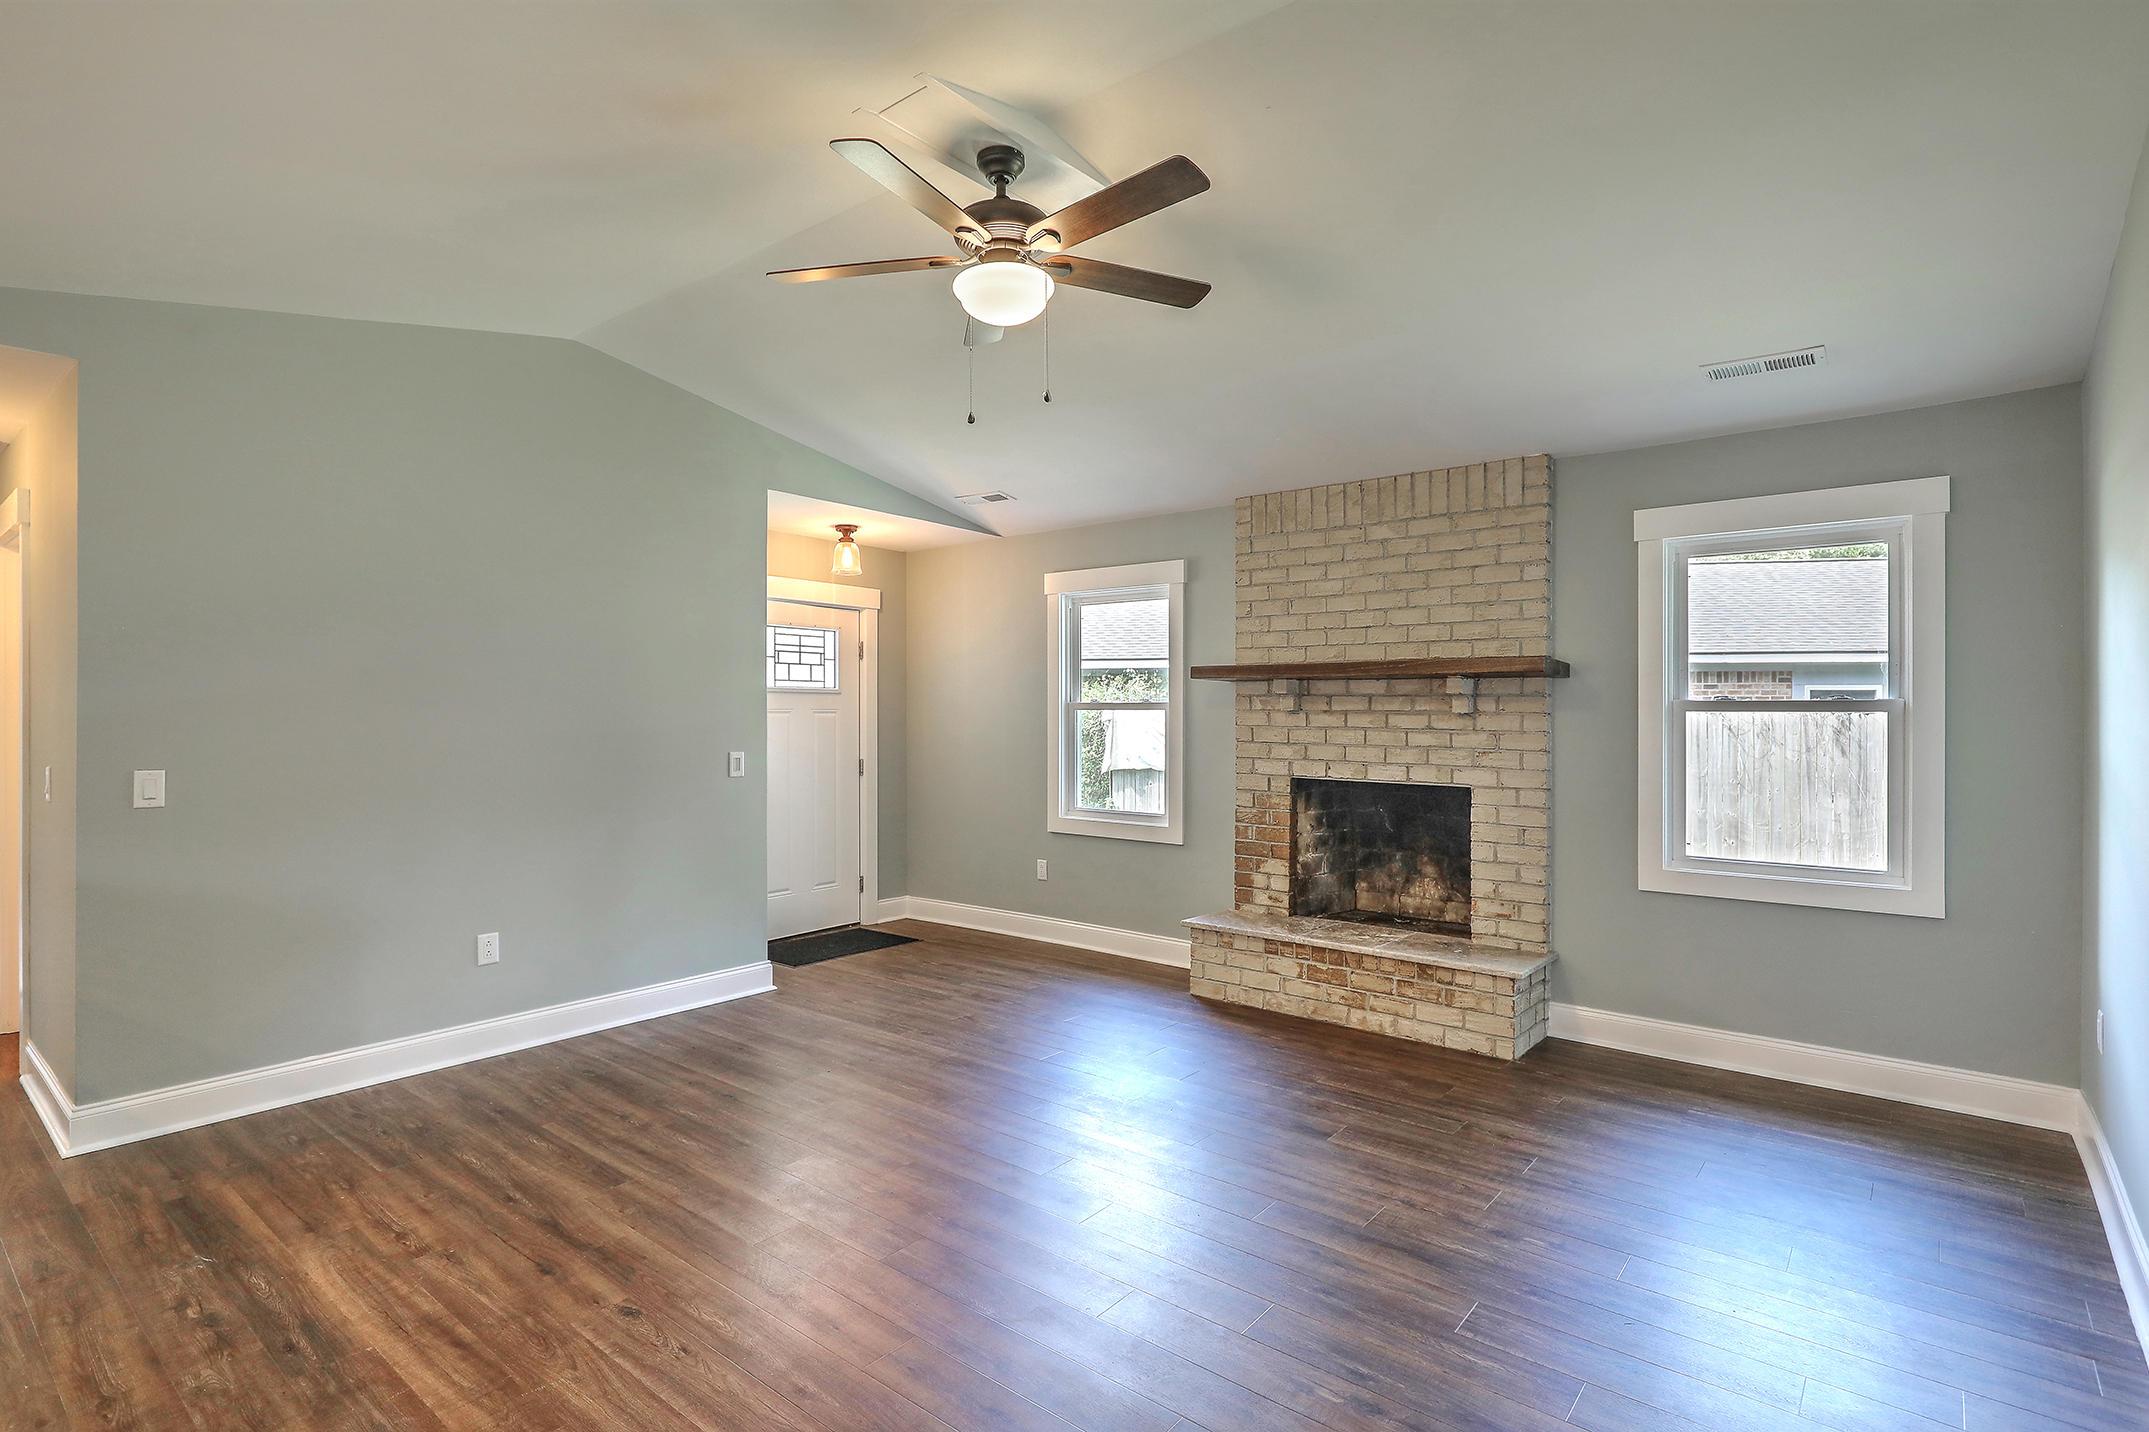 Bruno Acres Homes For Sale - 1674 Durkee, Charleston, SC - 1